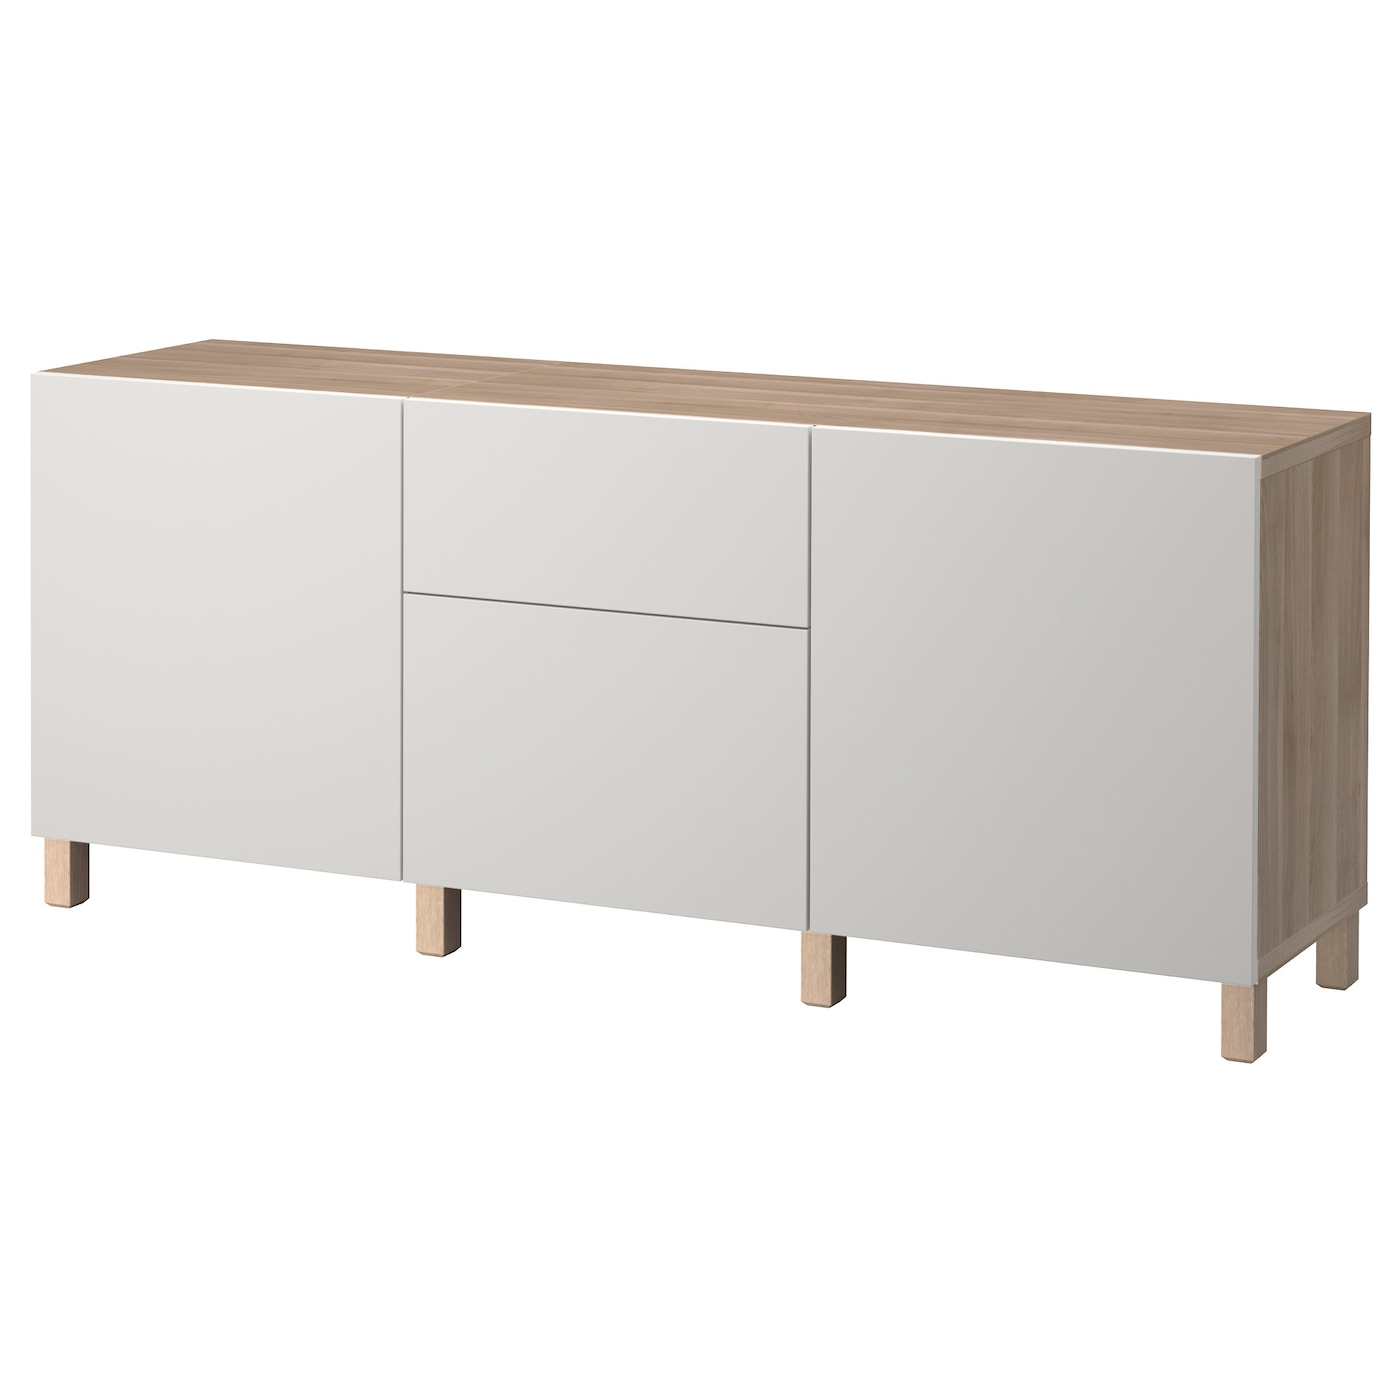 best combinaison rangement tiroirs motif noyer teint gris lappviken gris clair 180x40x74 cm ikea. Black Bedroom Furniture Sets. Home Design Ideas